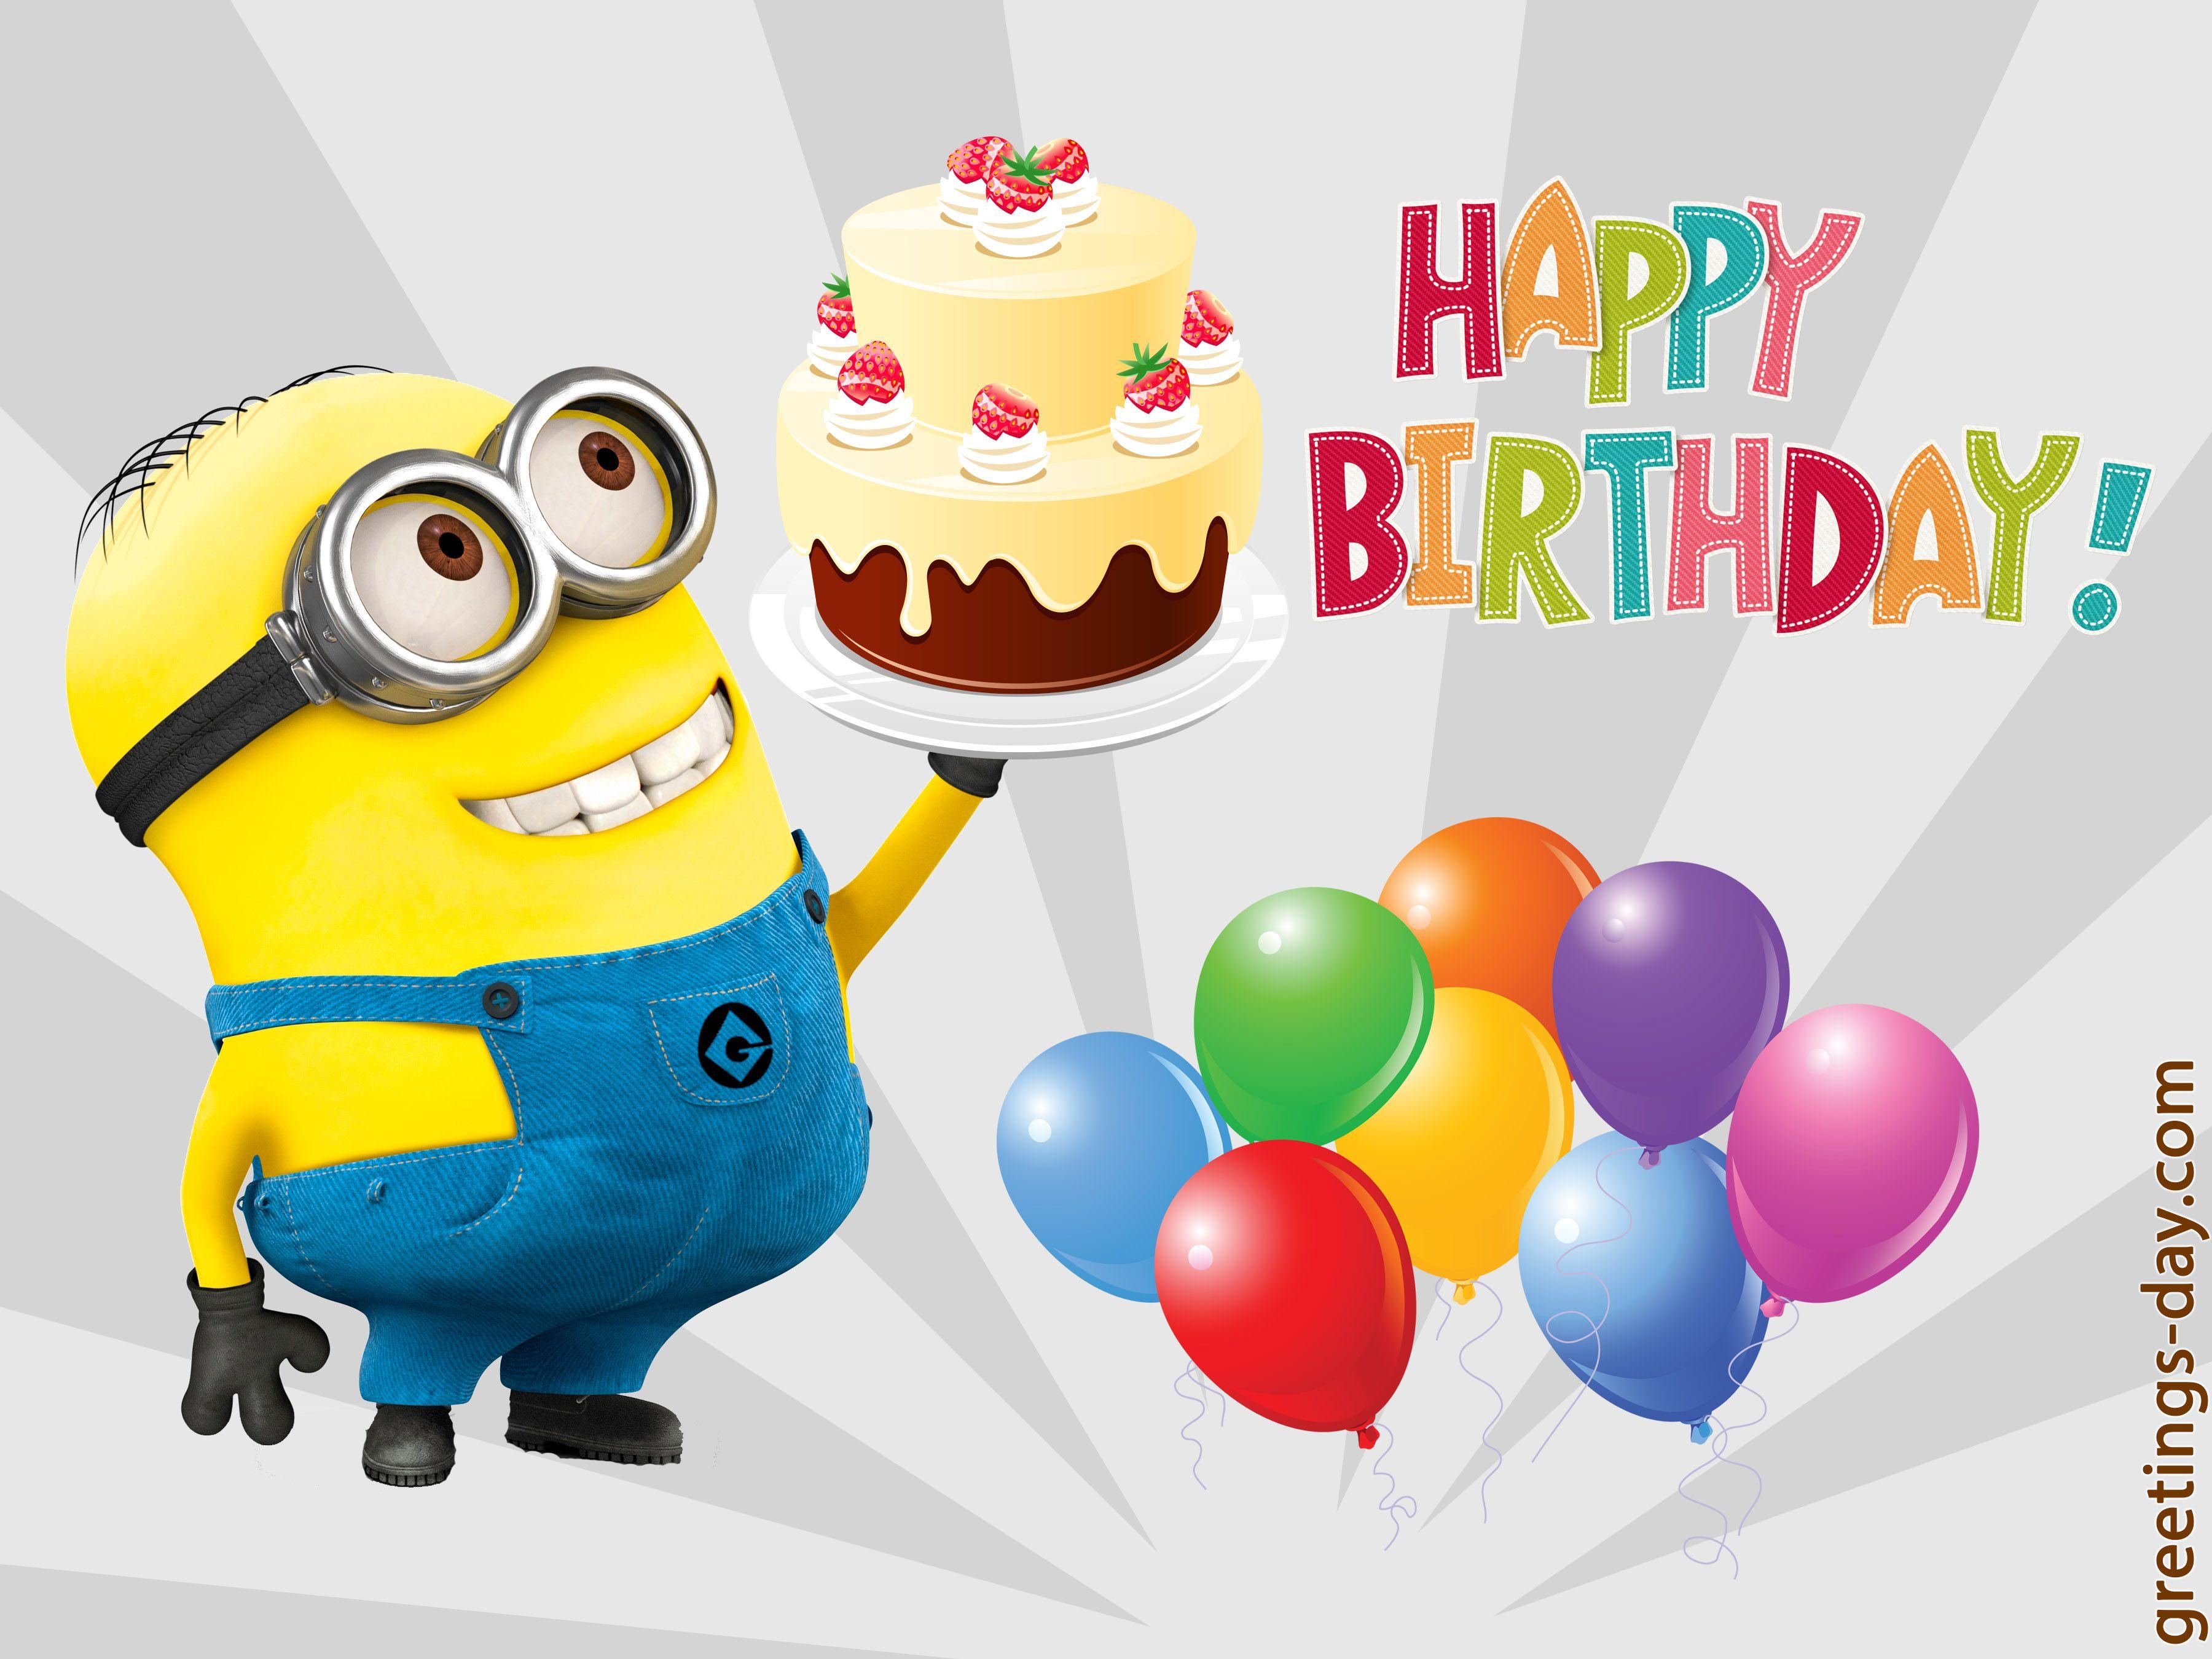 Pin By Diana Pawlik On Minions Rule Happy Birthday Minions Happy Birthday Song Happy Birthday Photos